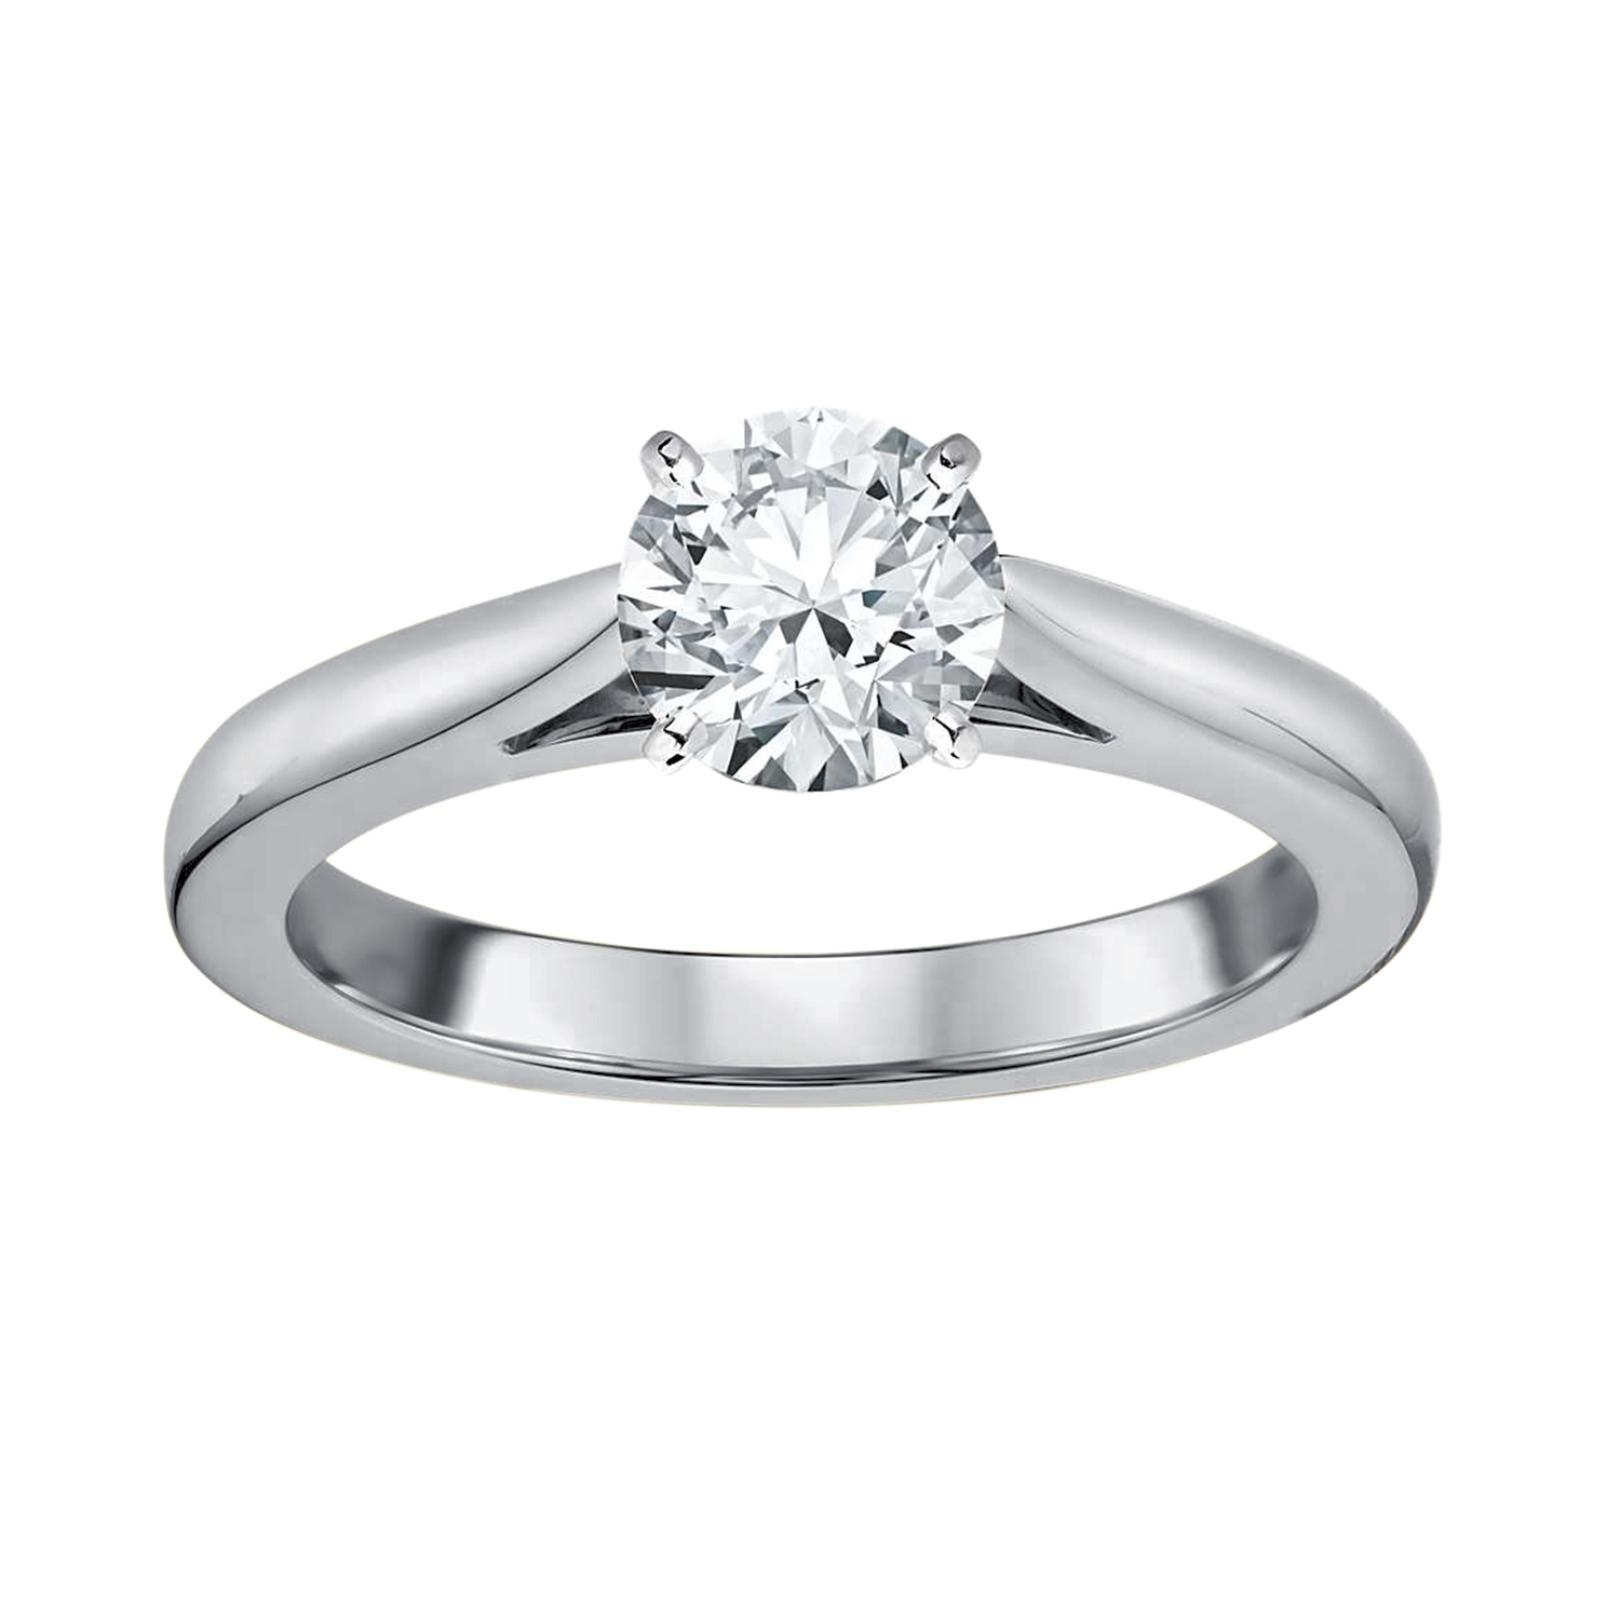 Tradition Diamond 1 Carat Certified Diamond 14K White Gold